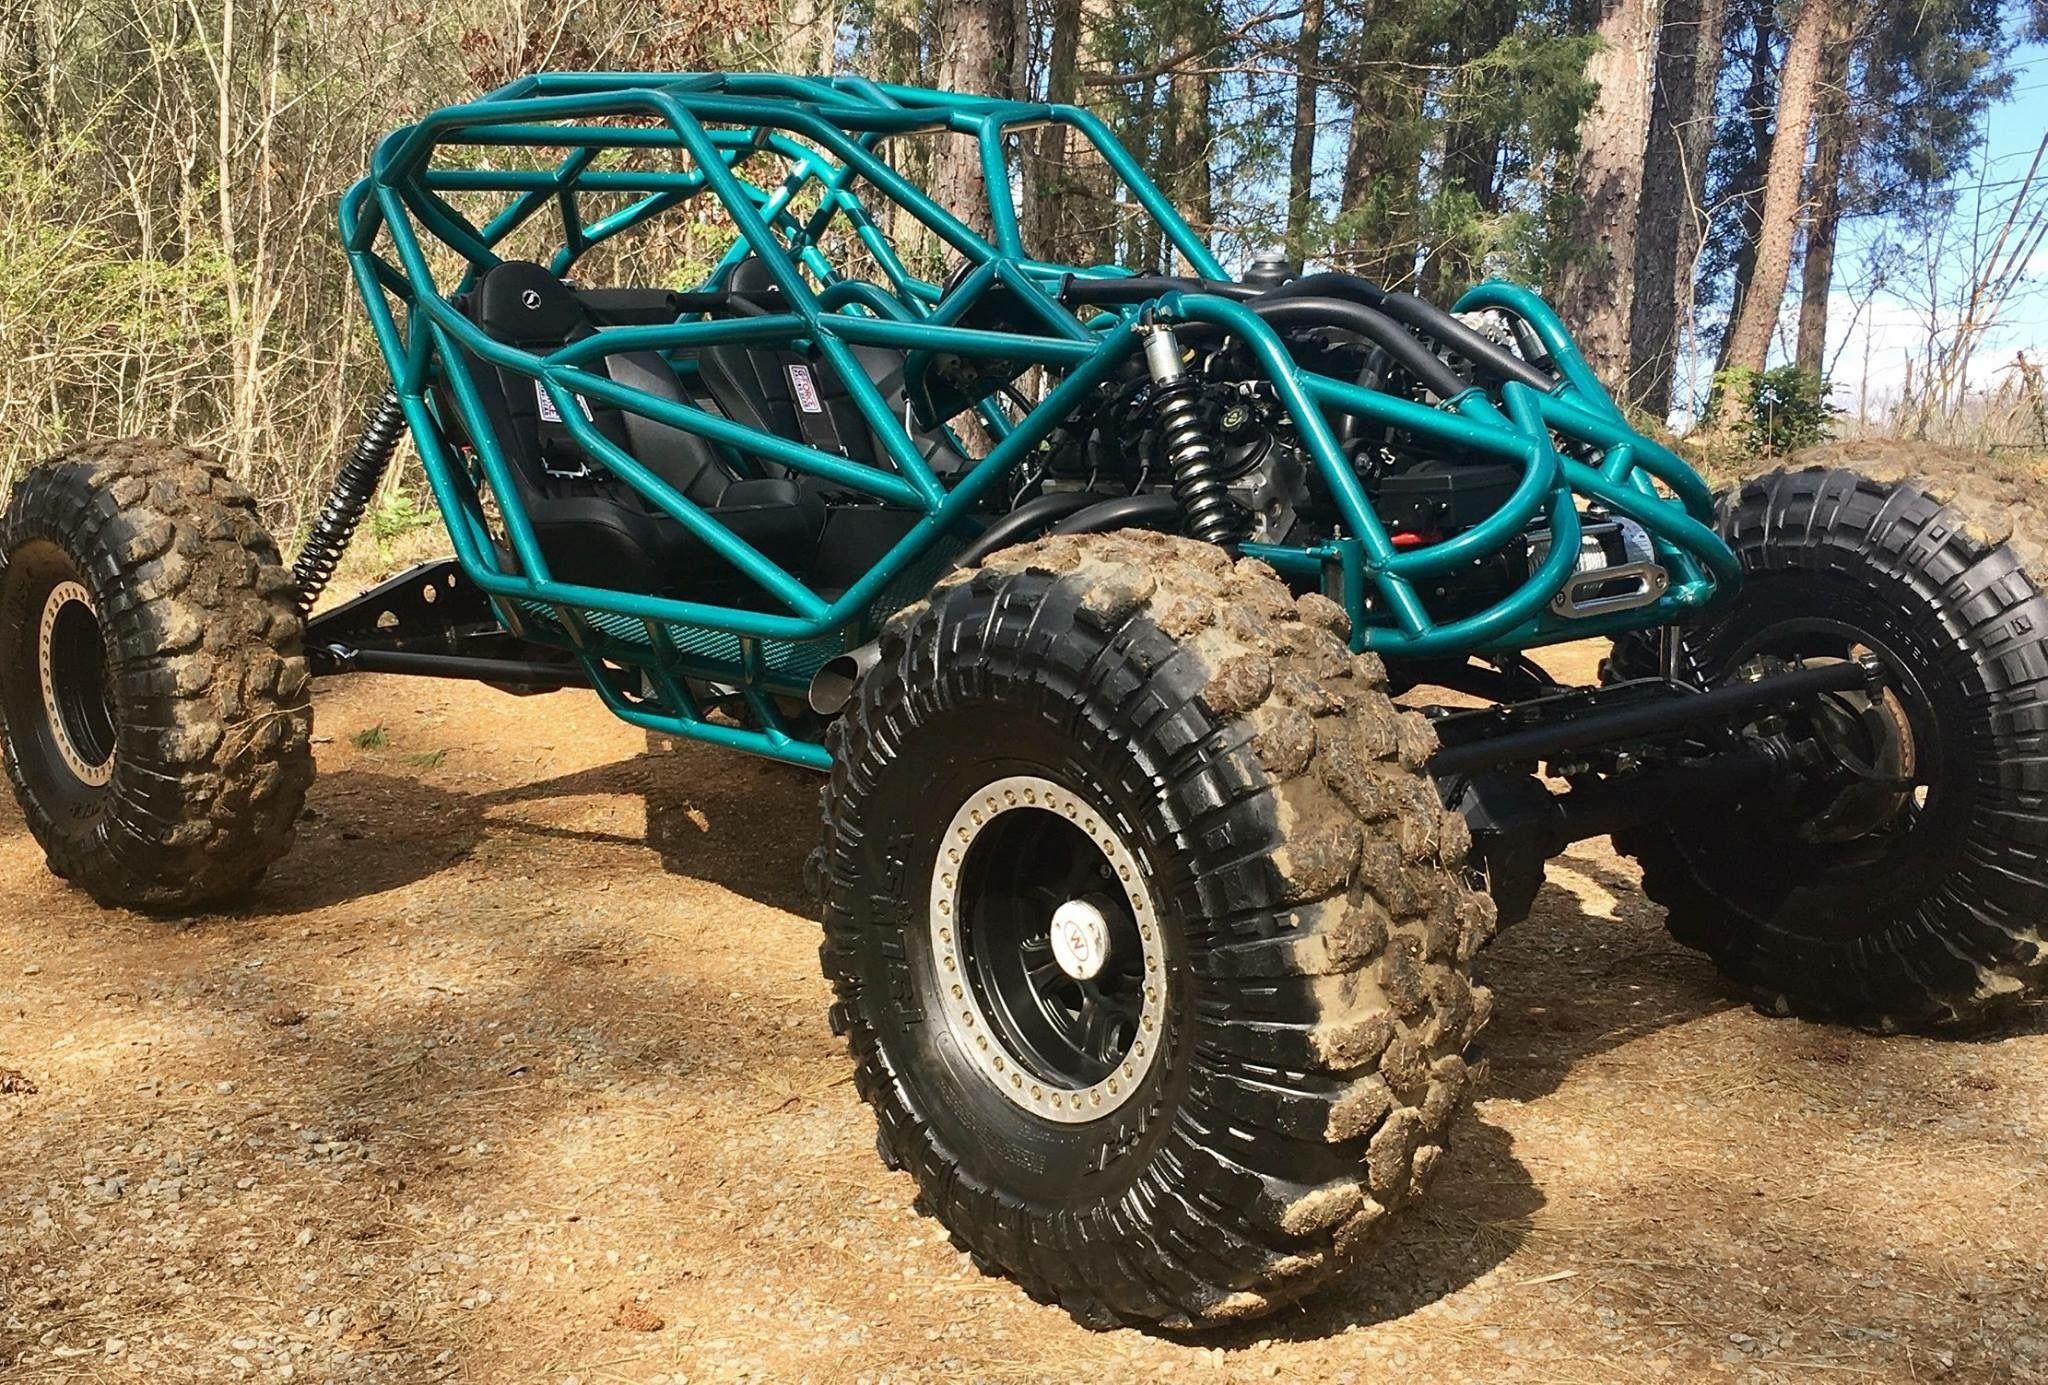 Killer Rock Bouncer Cars Rockcrawling and cool Rides